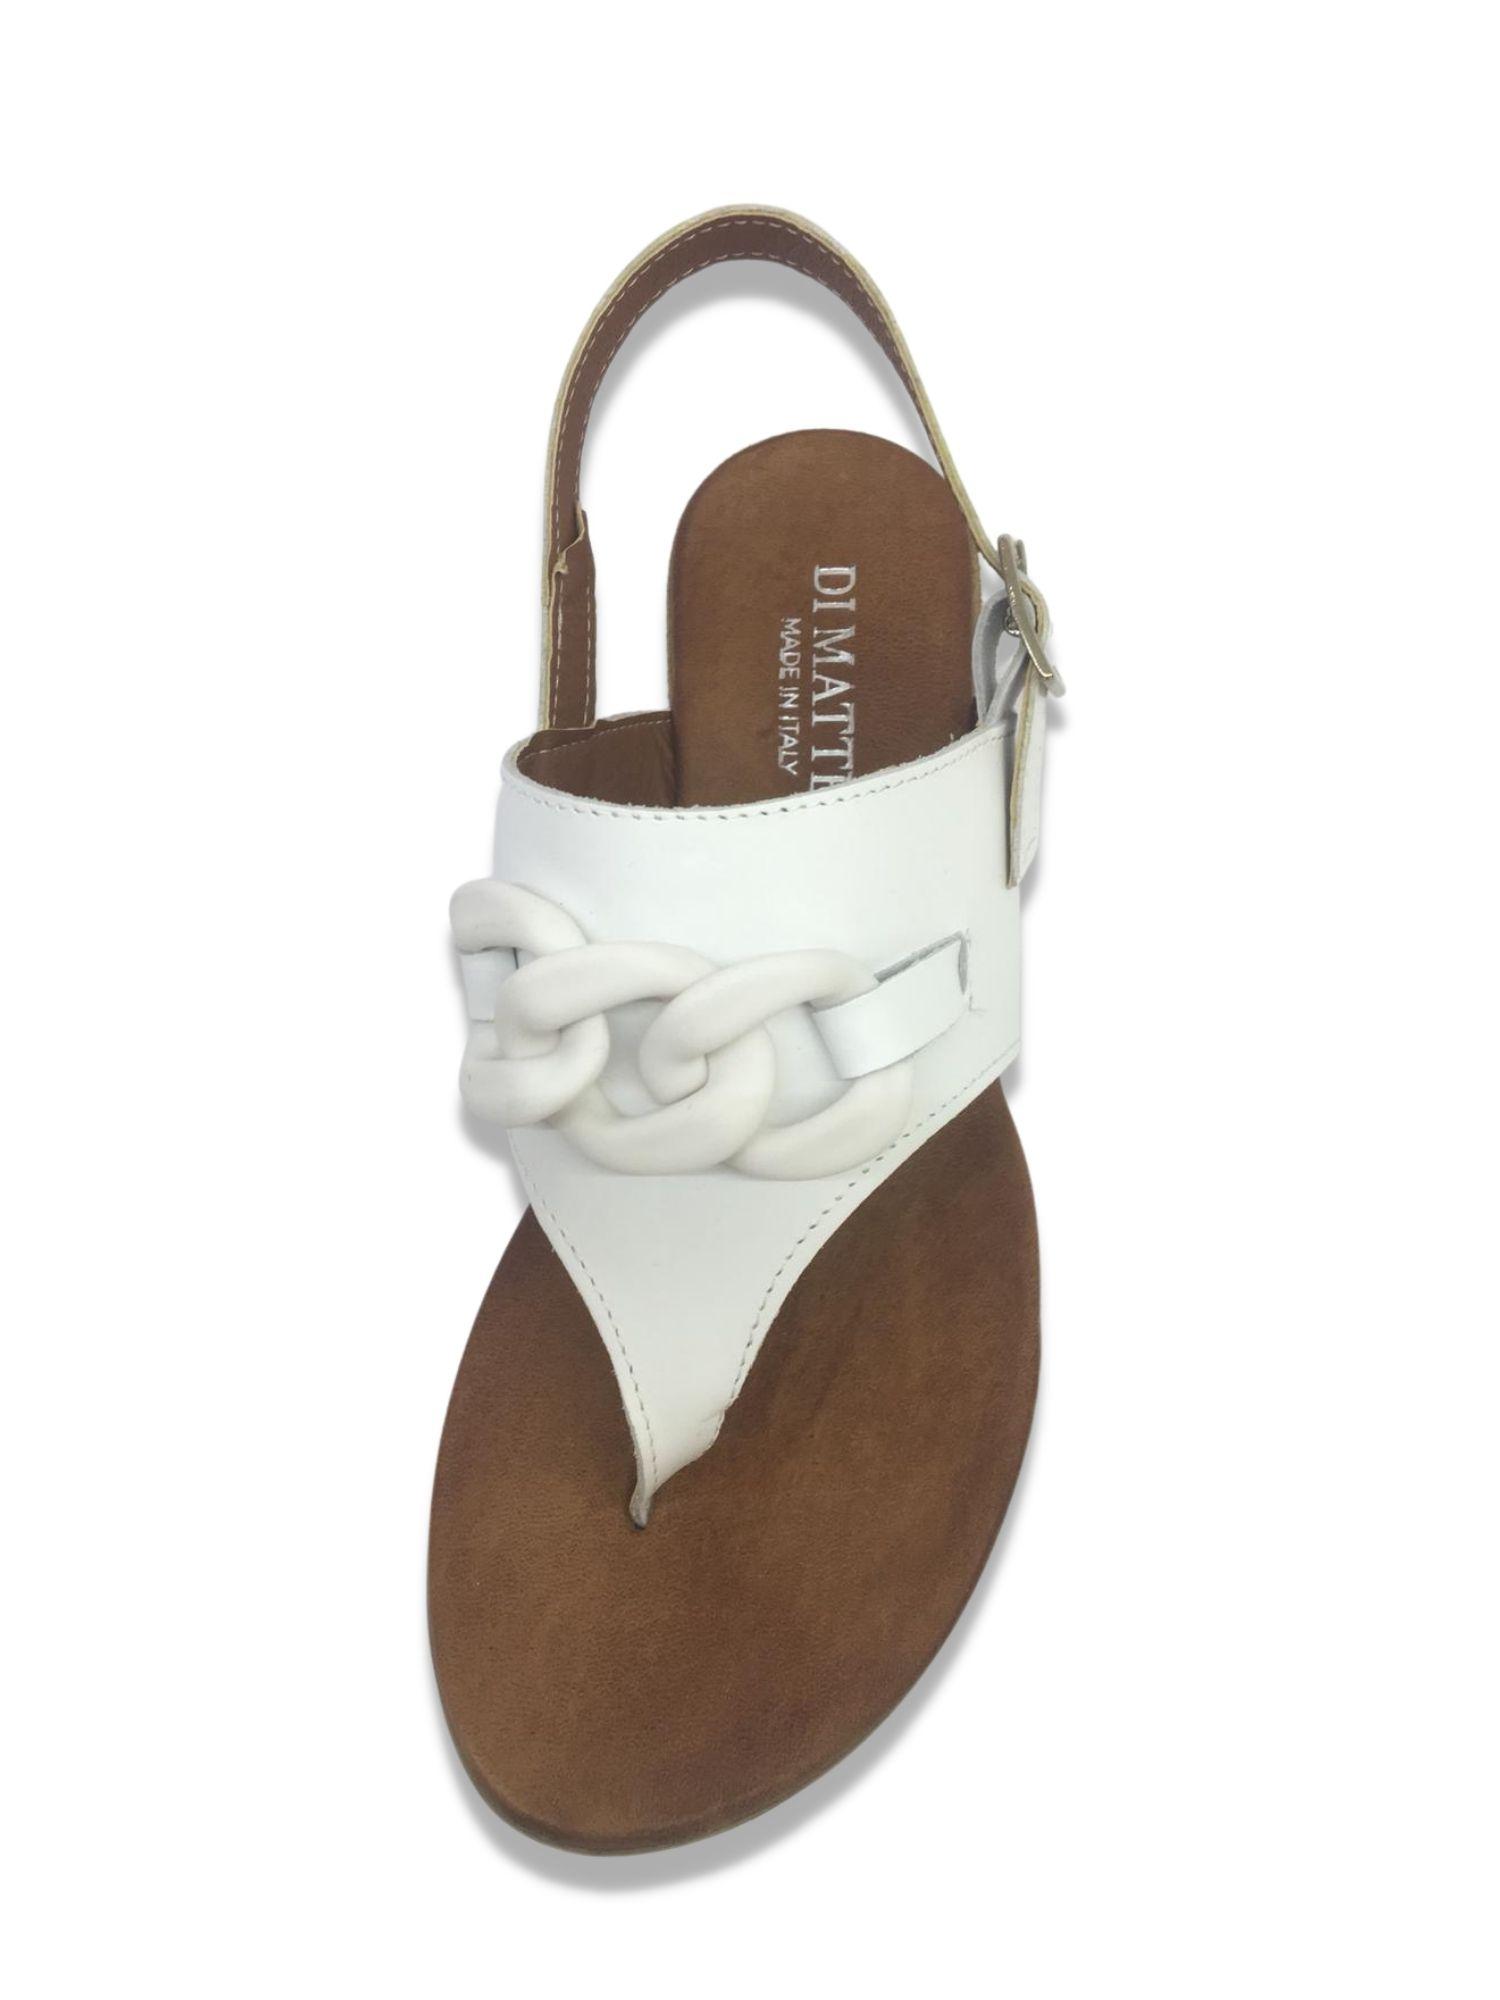 Sandalo infradito Made in Italy 203 Bianco alto